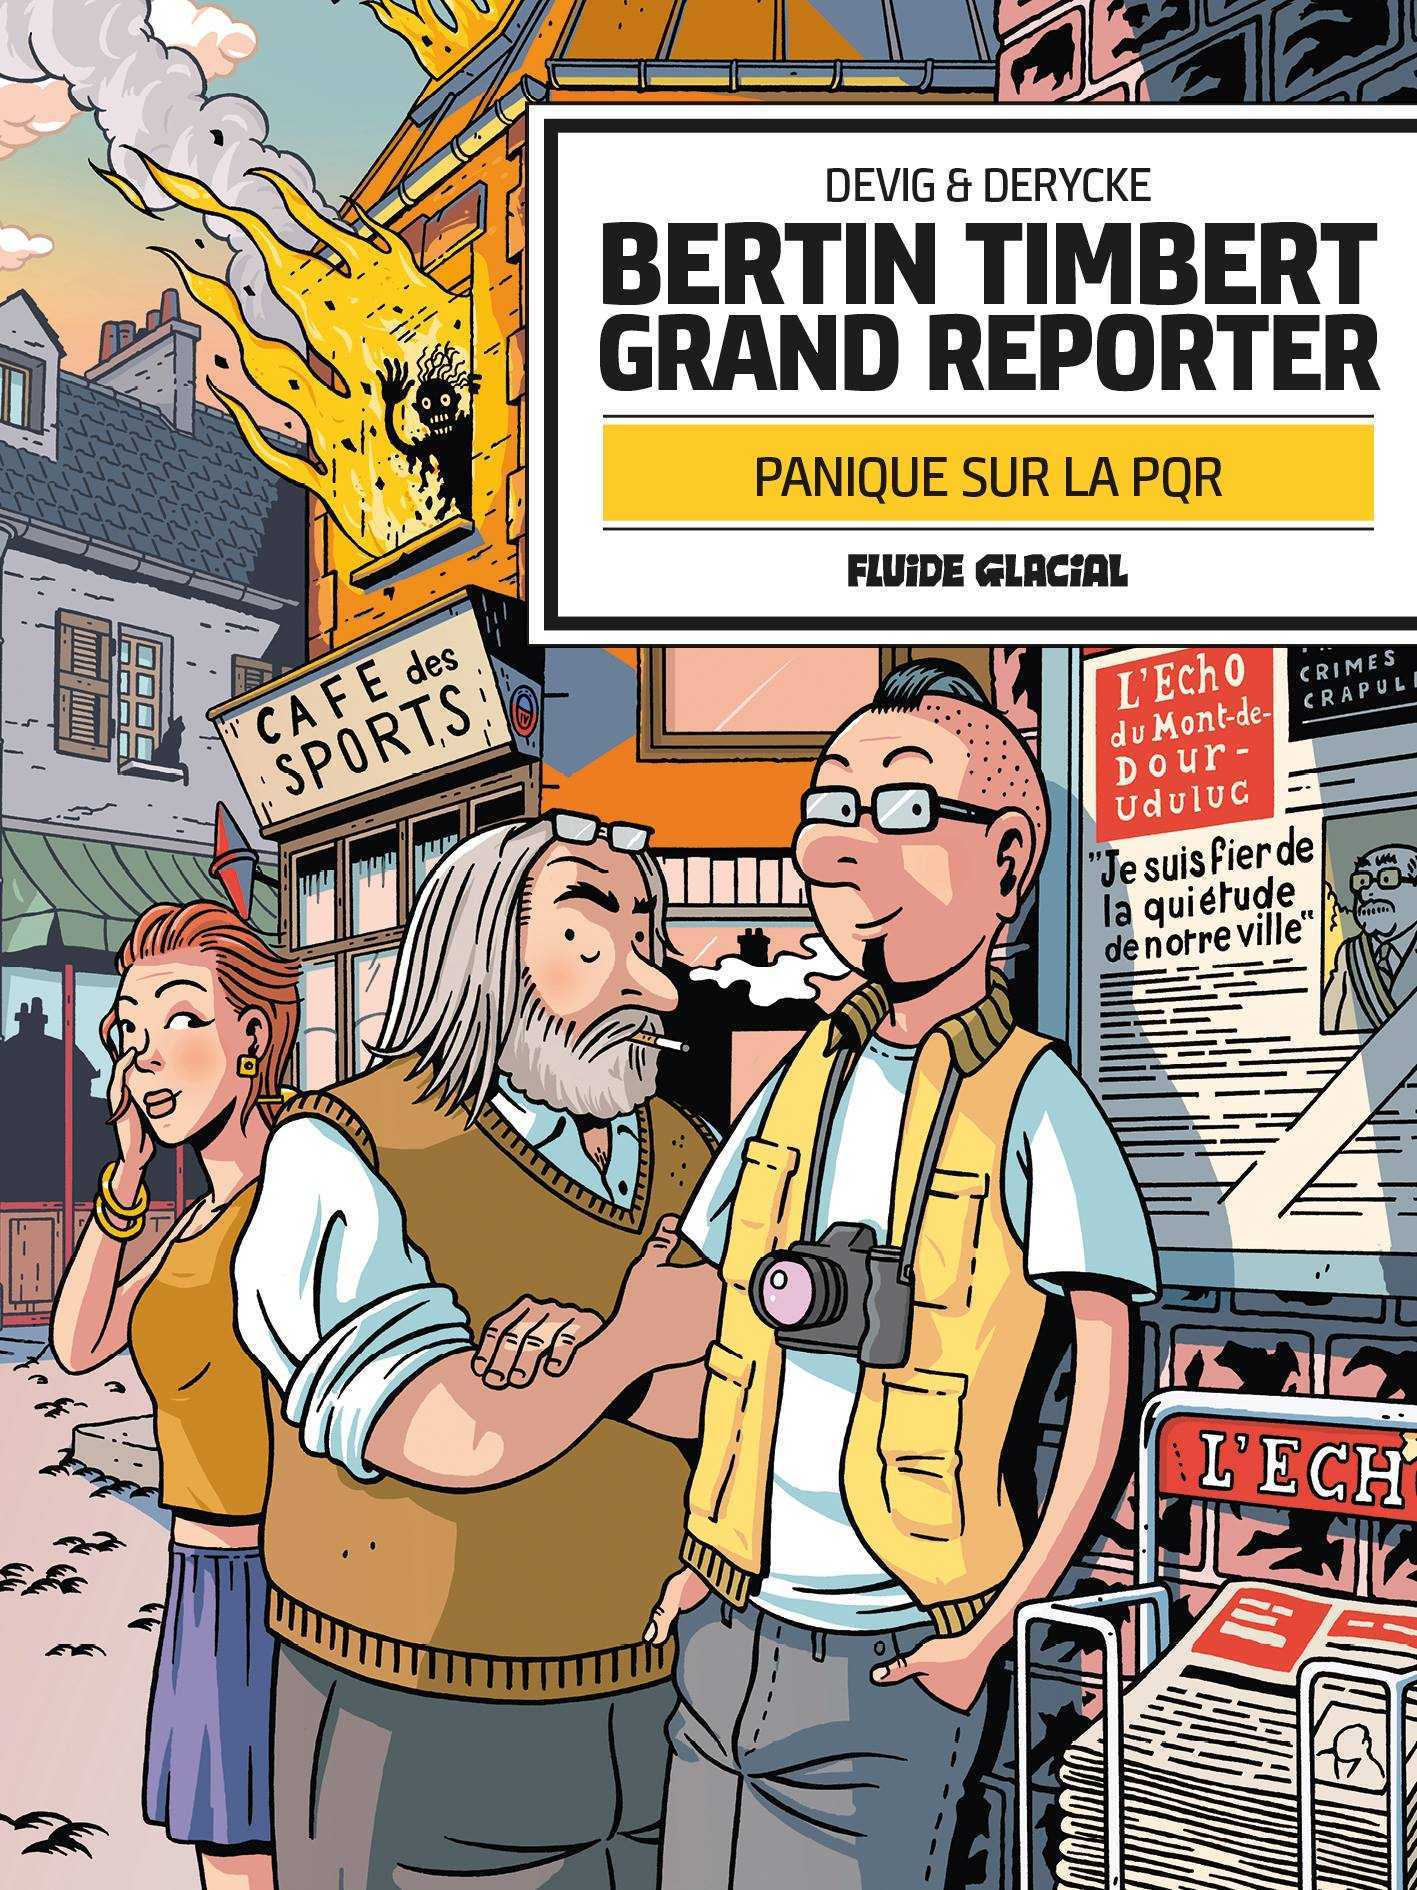 Bertin Timbert grand reporter, horreur malheur, la samba de Tintin